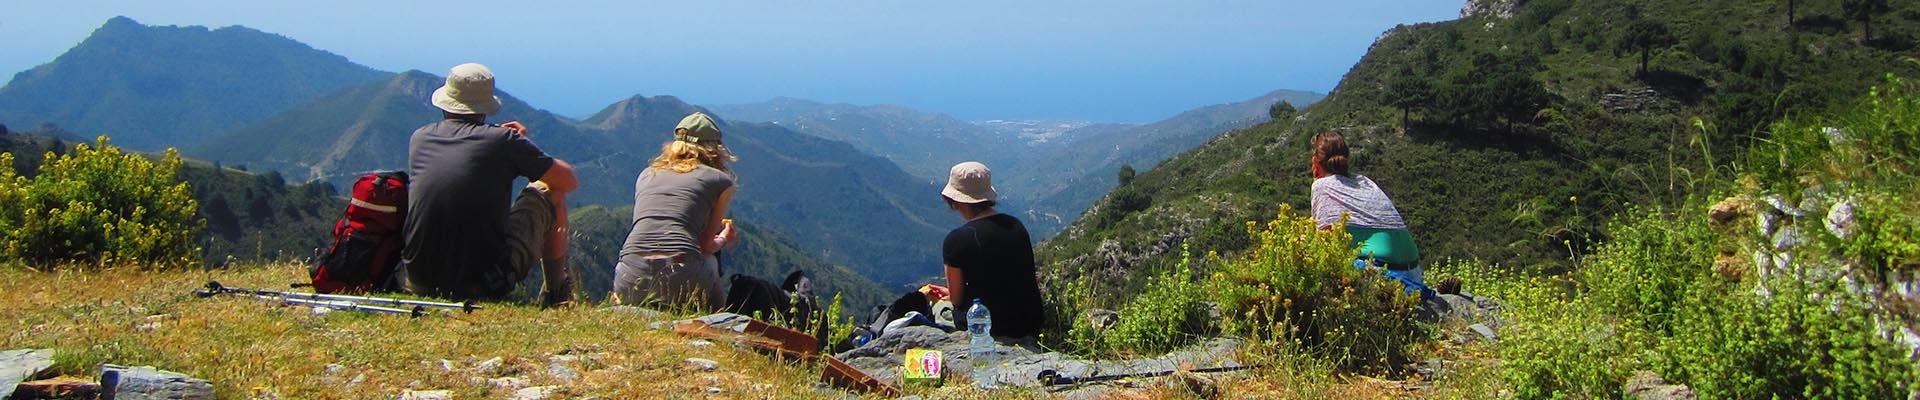 Single reizen Andalusië